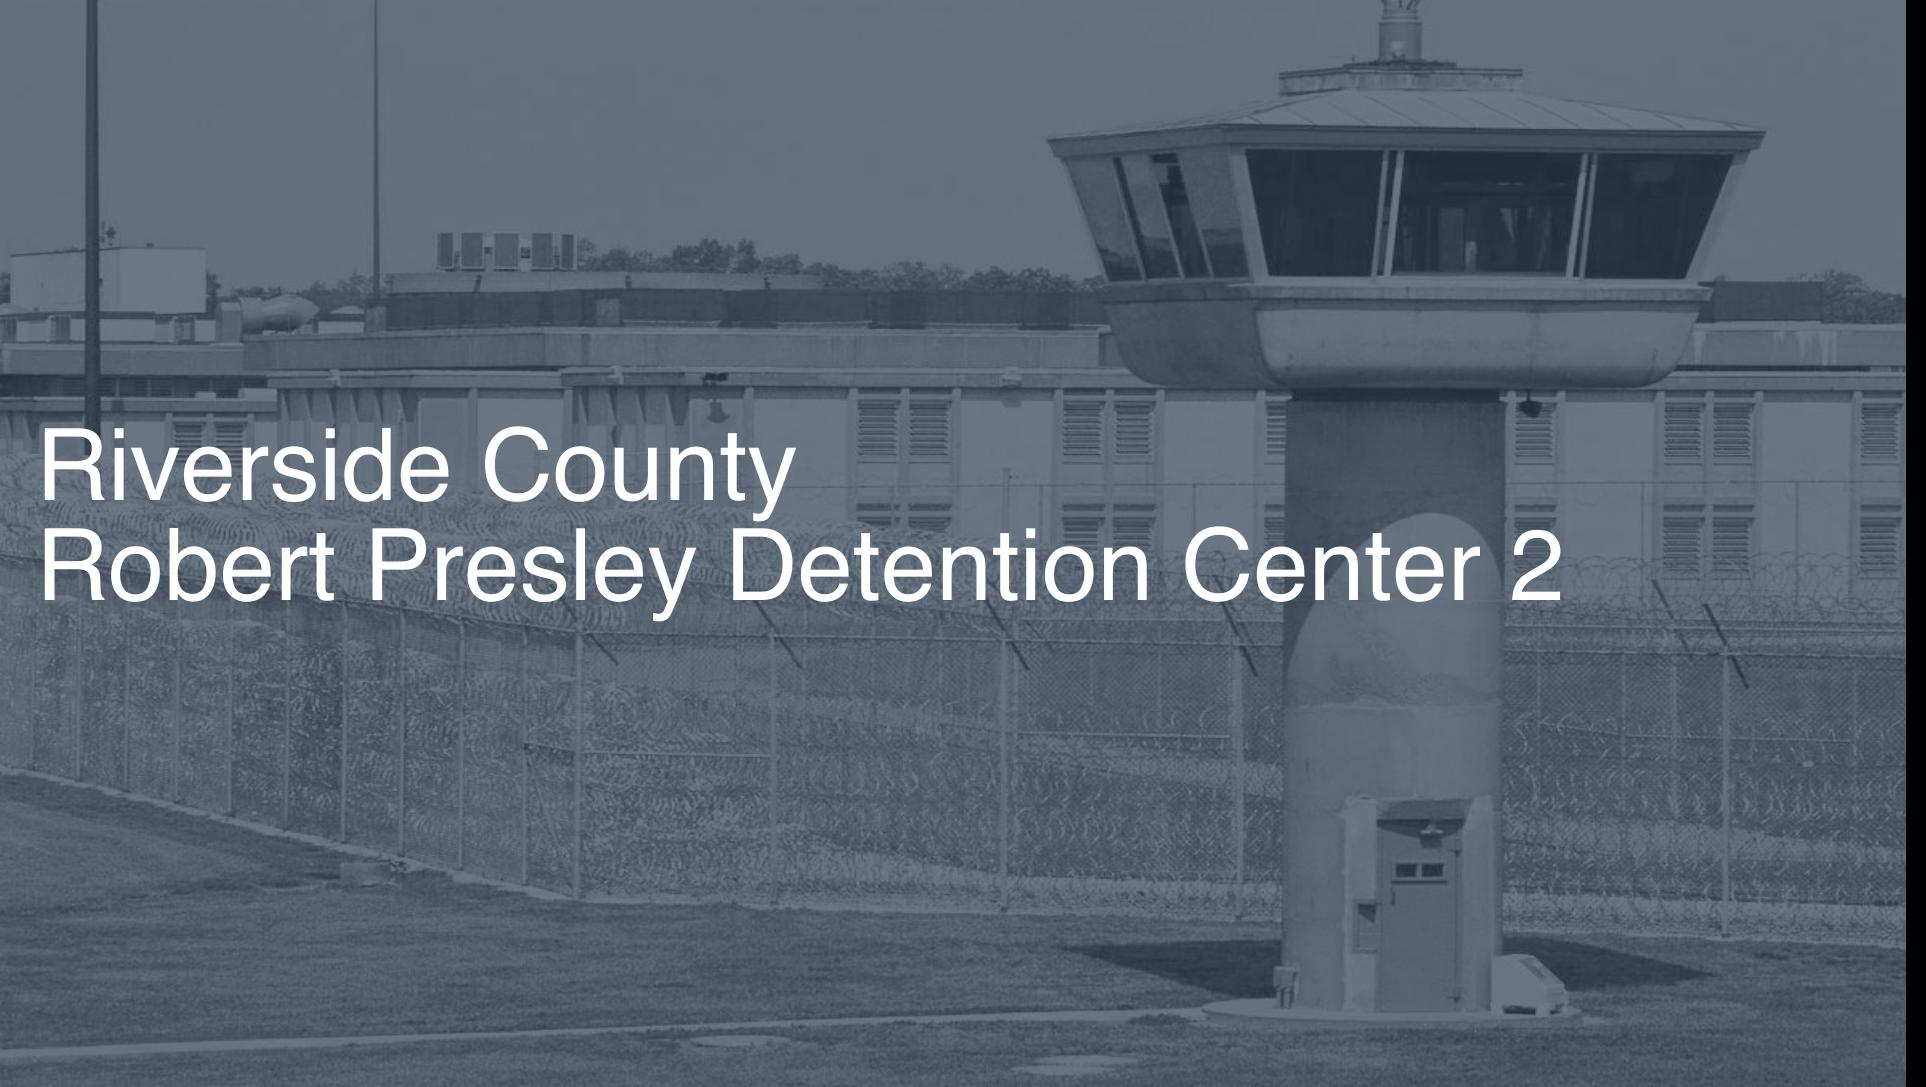 Riverside County – Robert Presley Detention Center